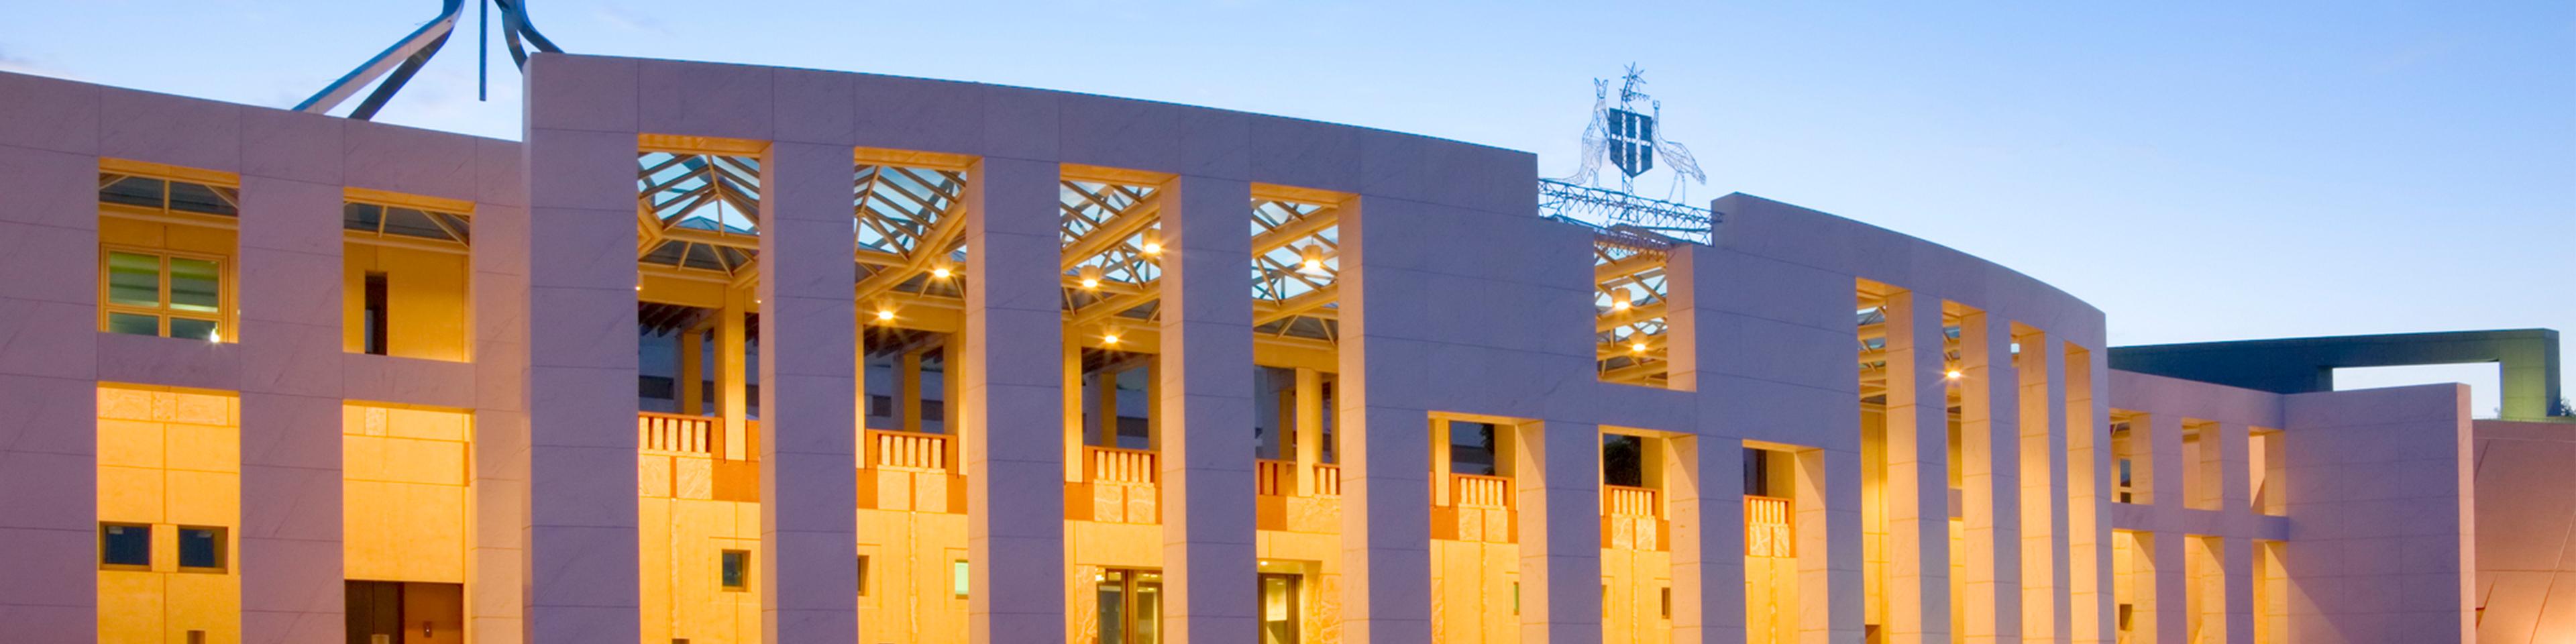 2021-2022 CCH Parliament Federal Budget Highlights